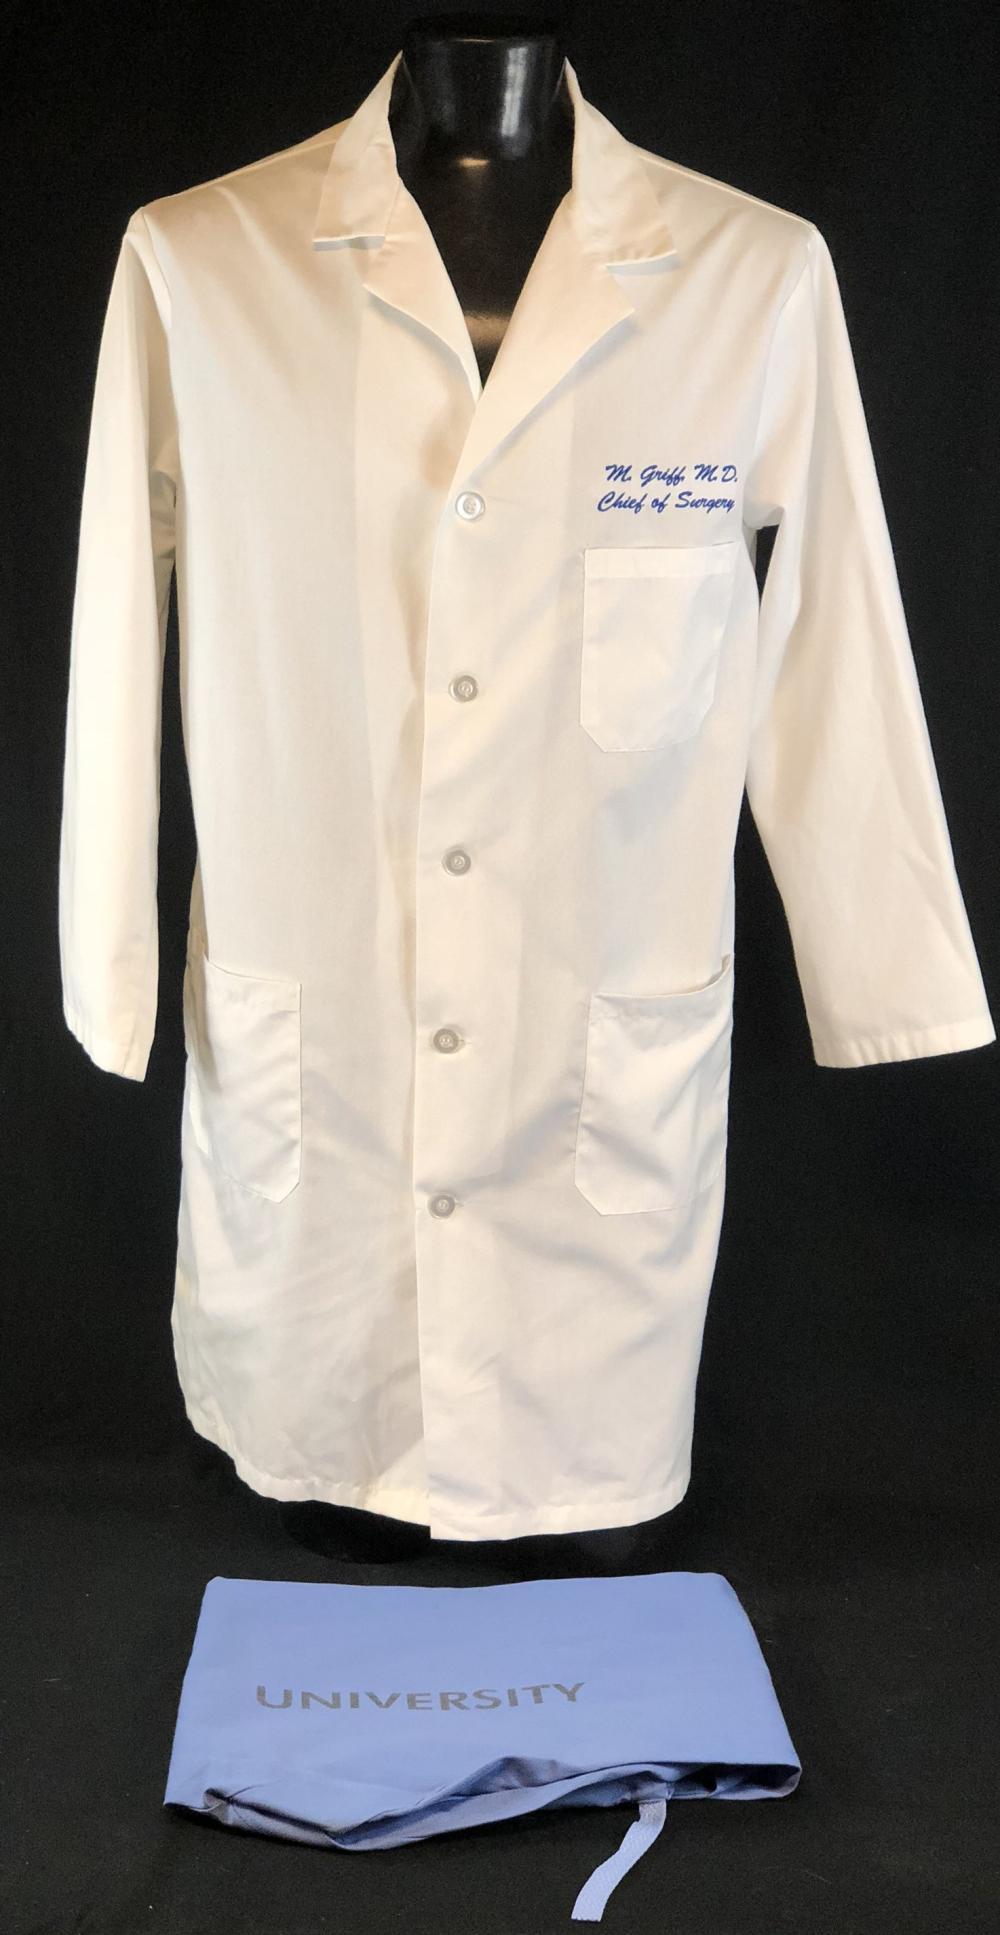 "ER (1994–2009) - ""M. Griff M.D. Chief Of Surgery"" Lab Coat & Scrub Bottoms"